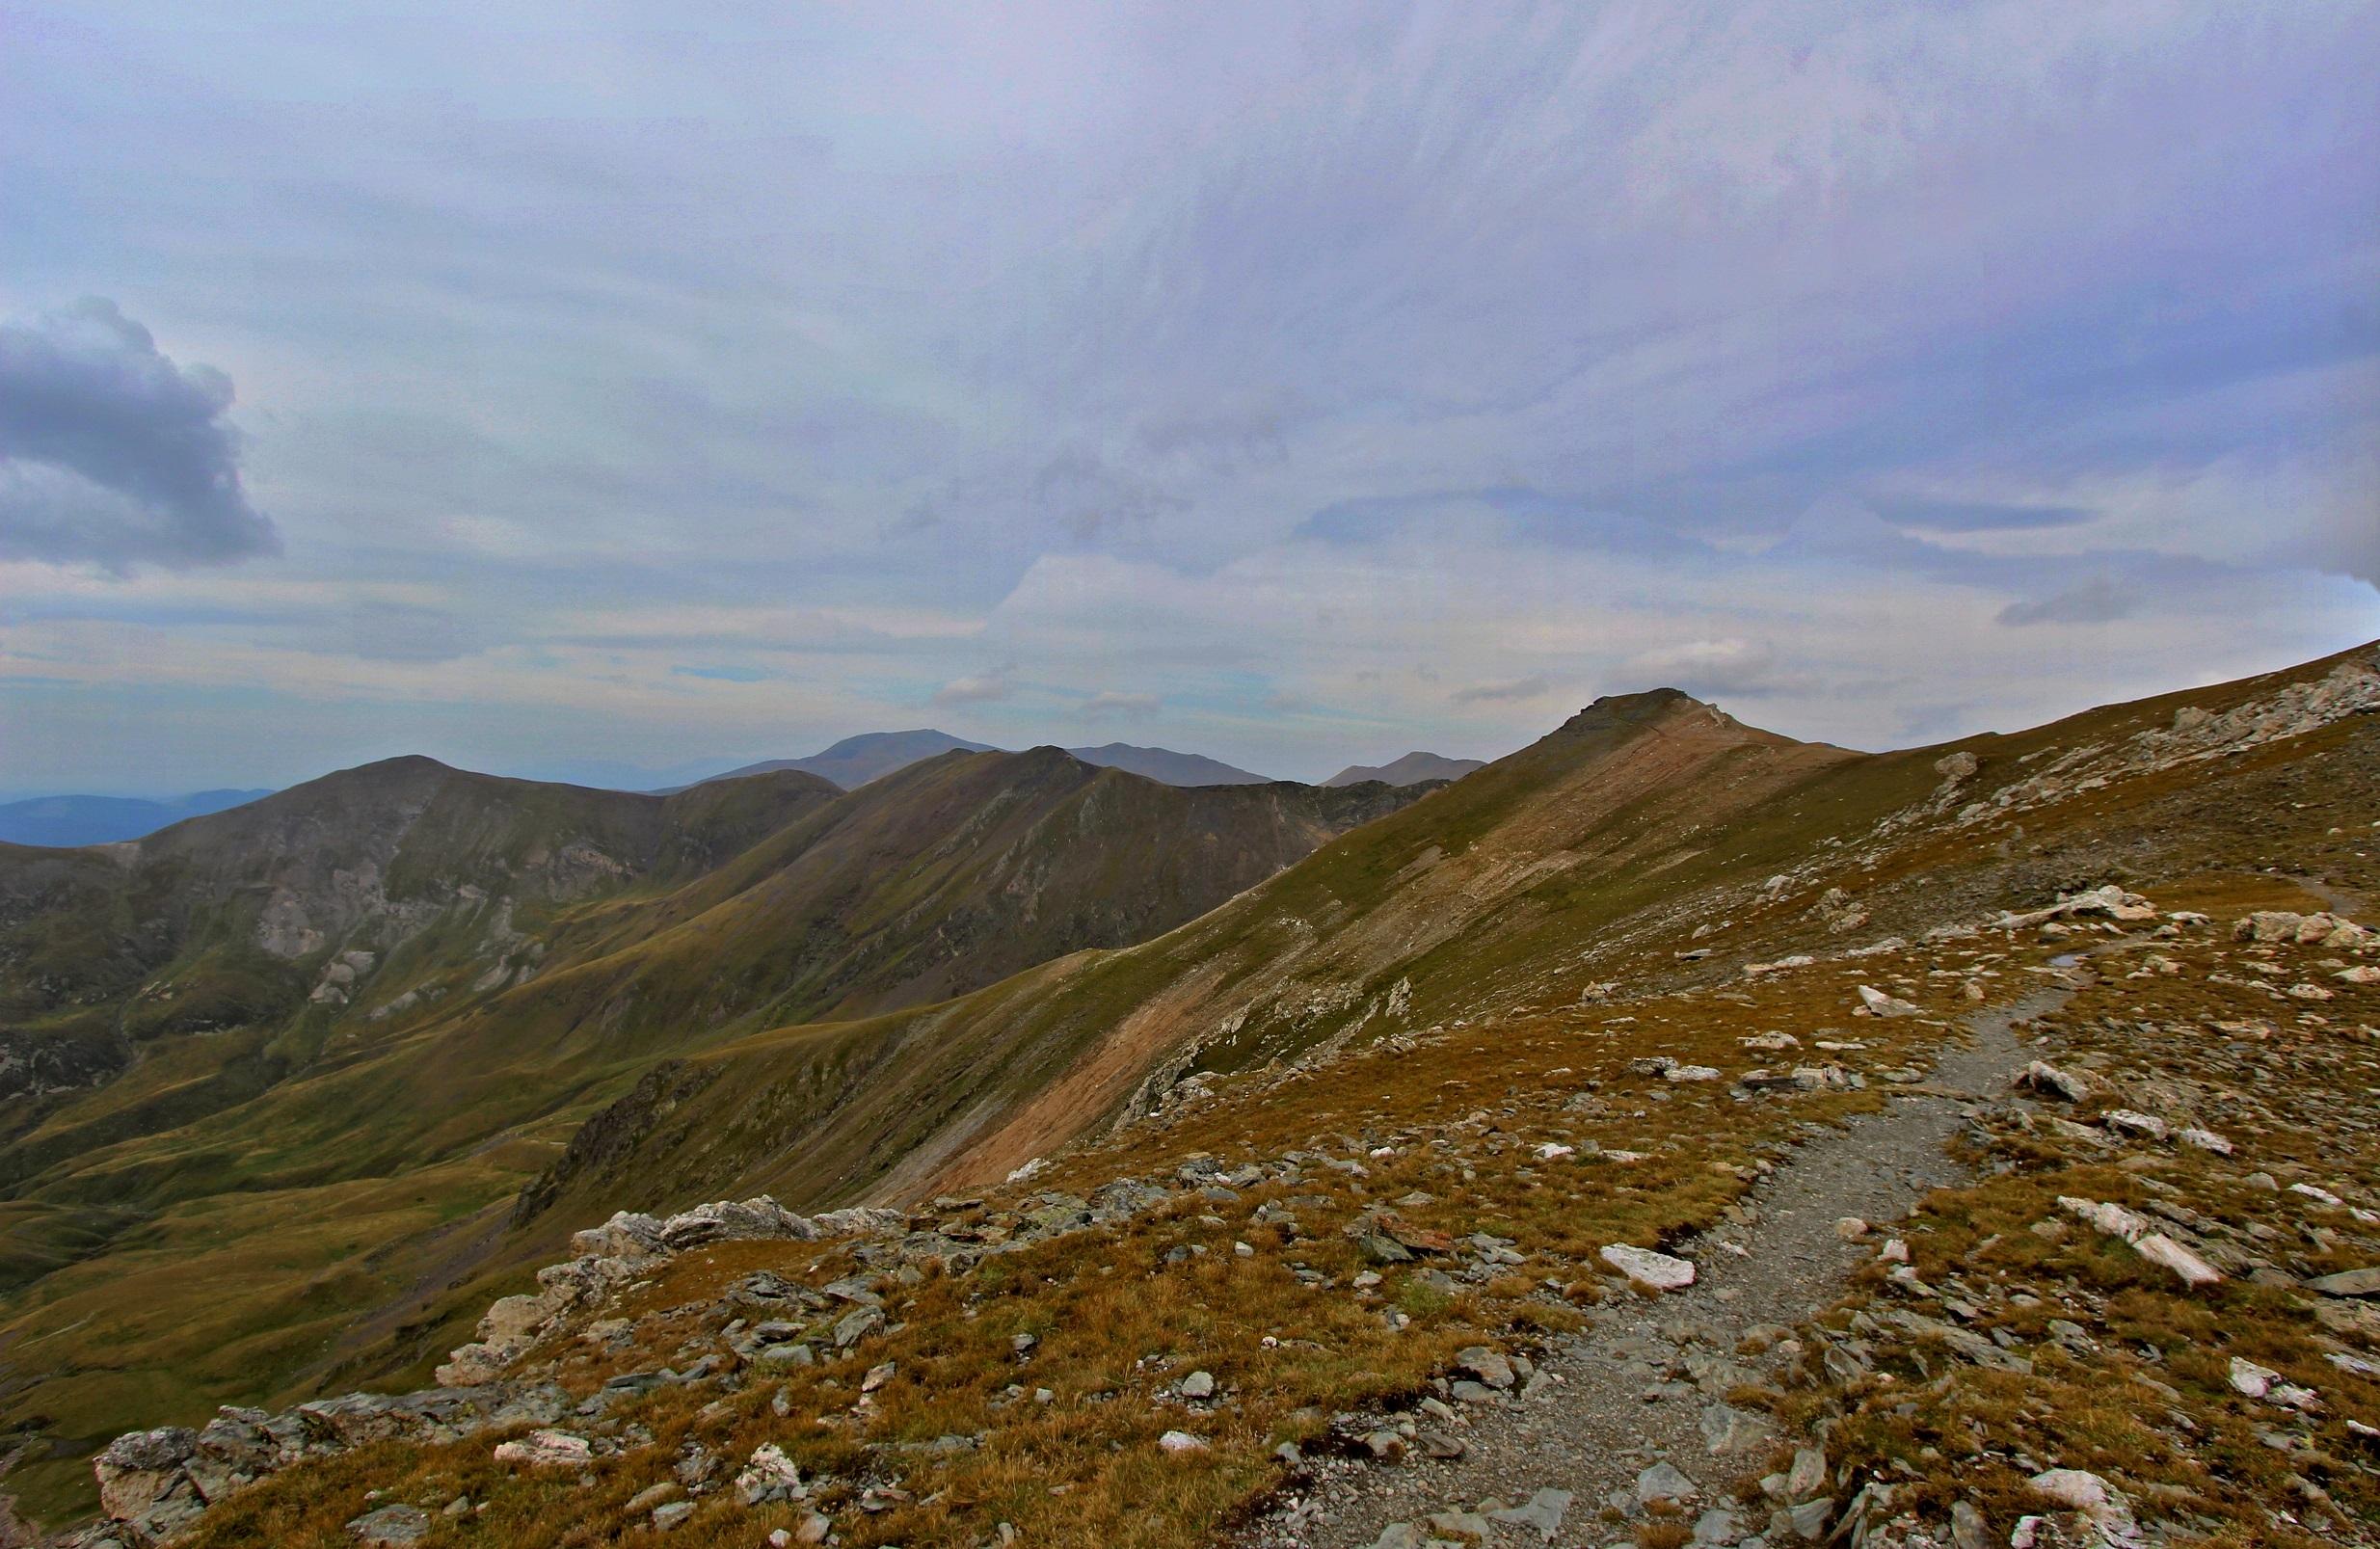 IMG_3812_panorama.jpg